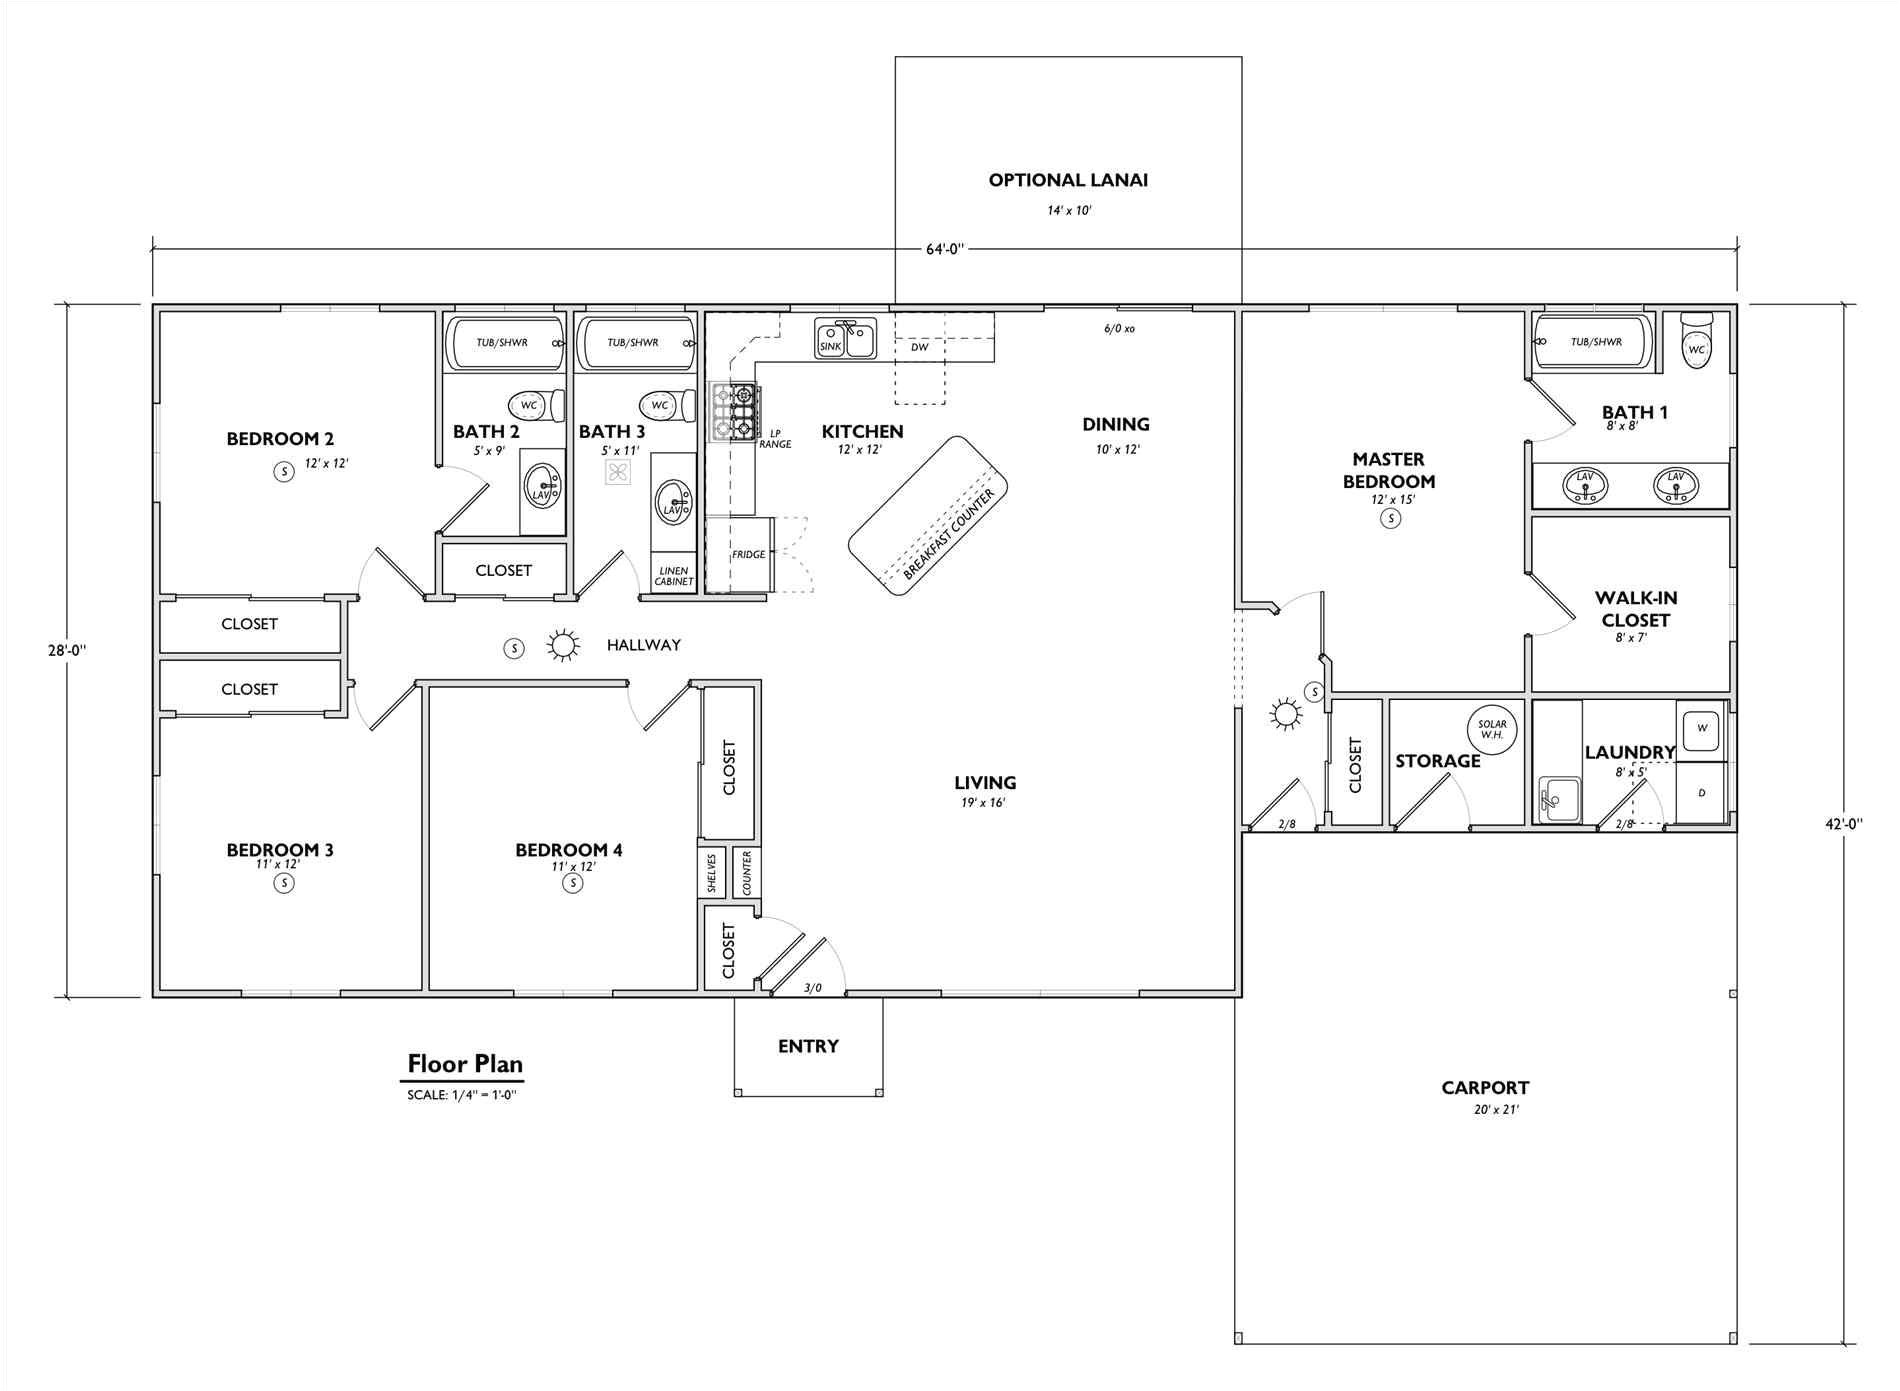 bedroom floor plans plan ideas in addition house bathroom corner sink renovation bathroom small master bedroom floor plans corner sink renovation ideas jpg